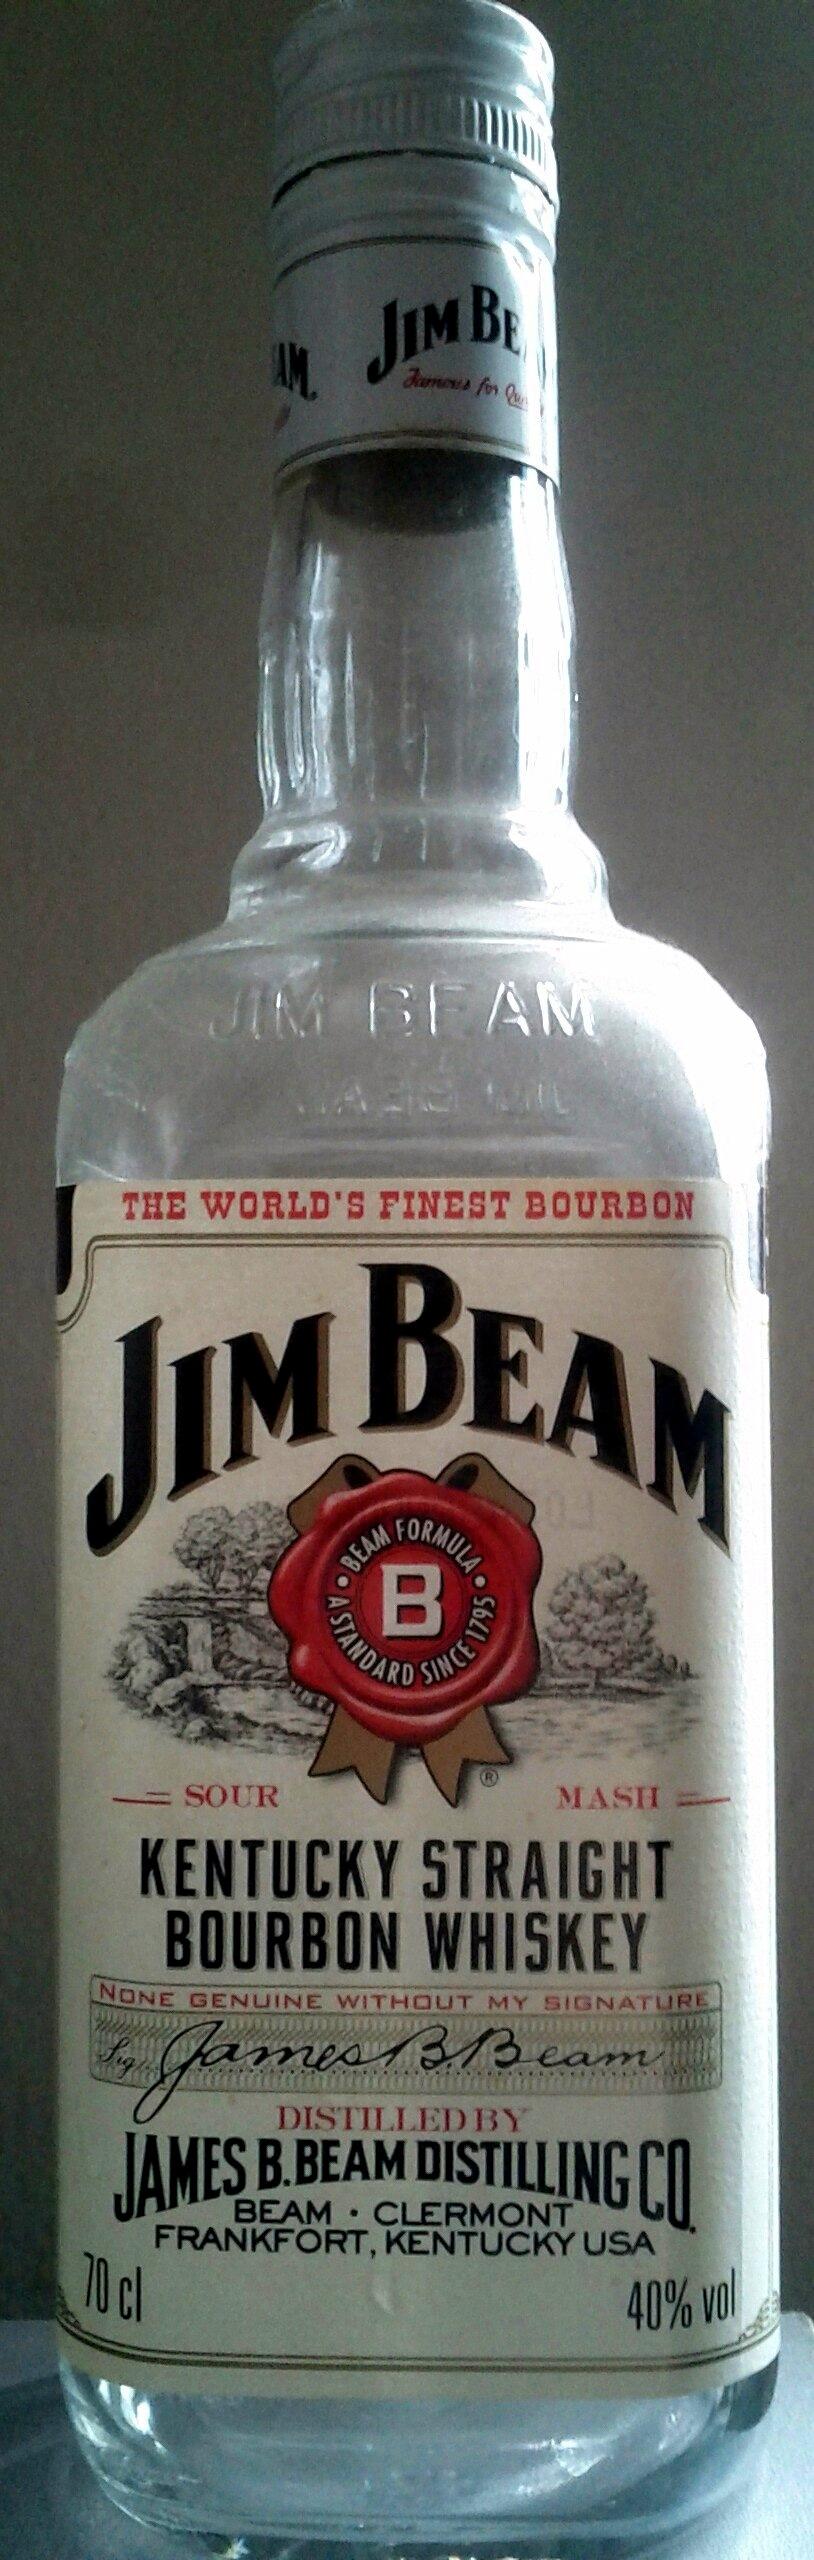 Kentucky Straight Bourbon Whiskey - Product